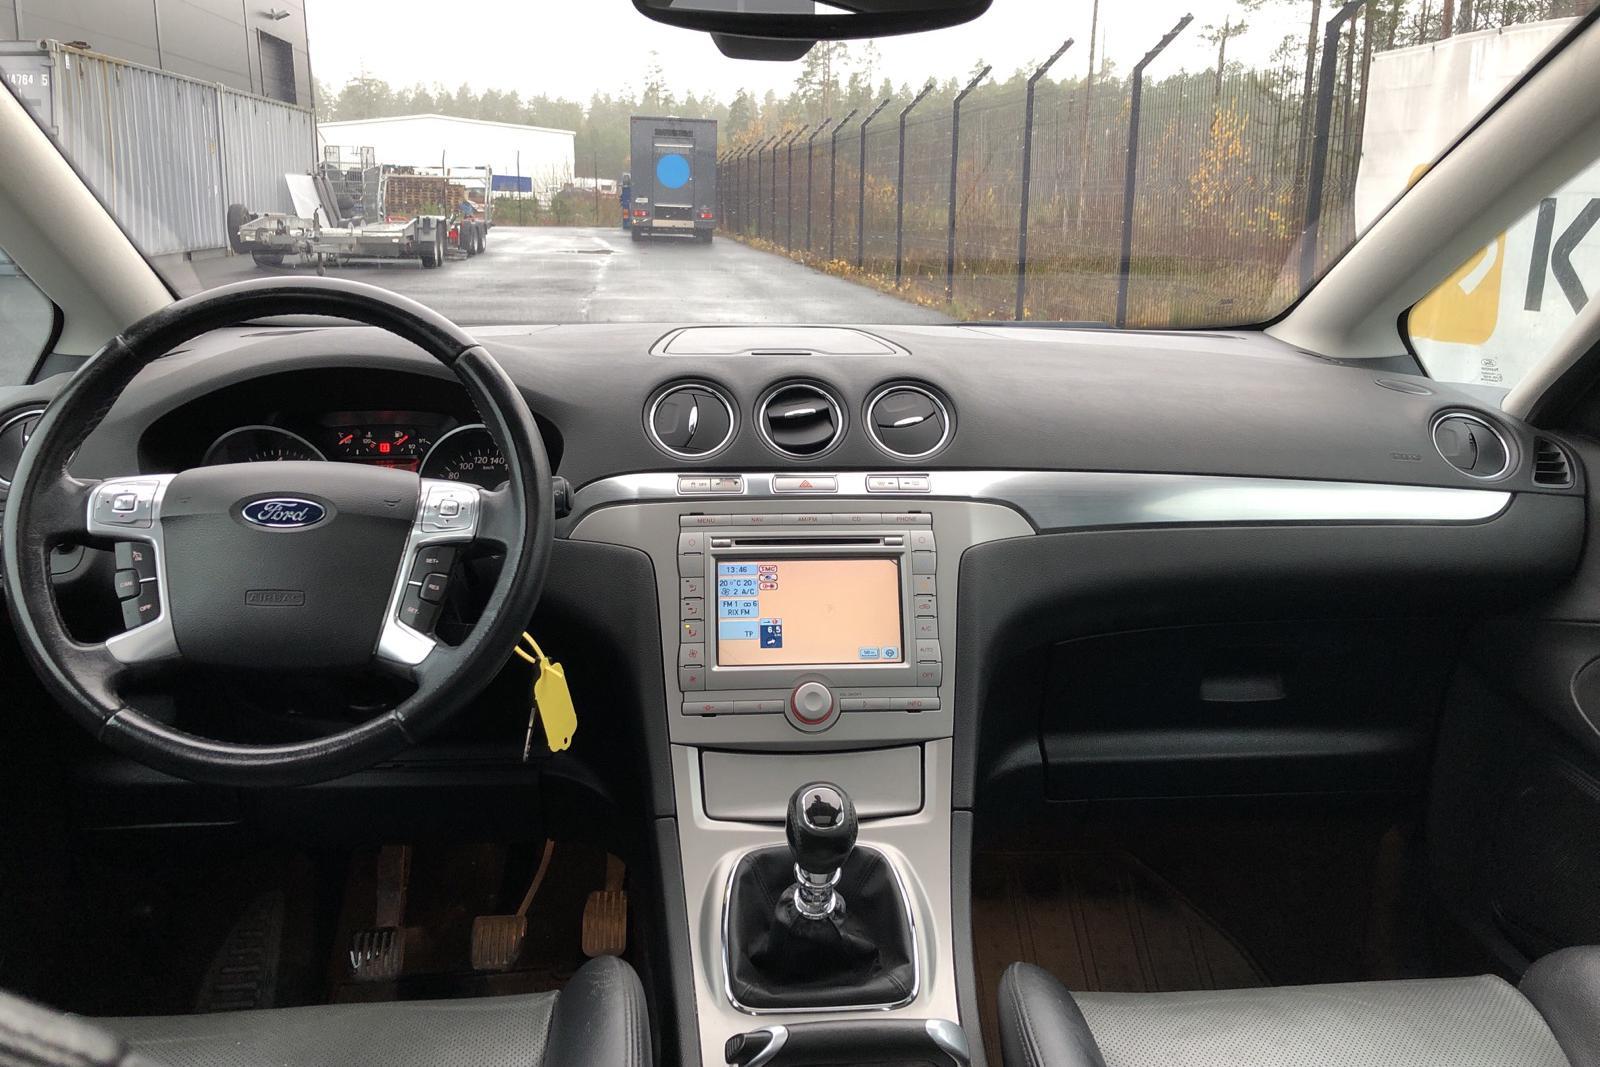 Ford S-MAX 2.5T (220hk) - 141 300 km - Manual - black - 2007